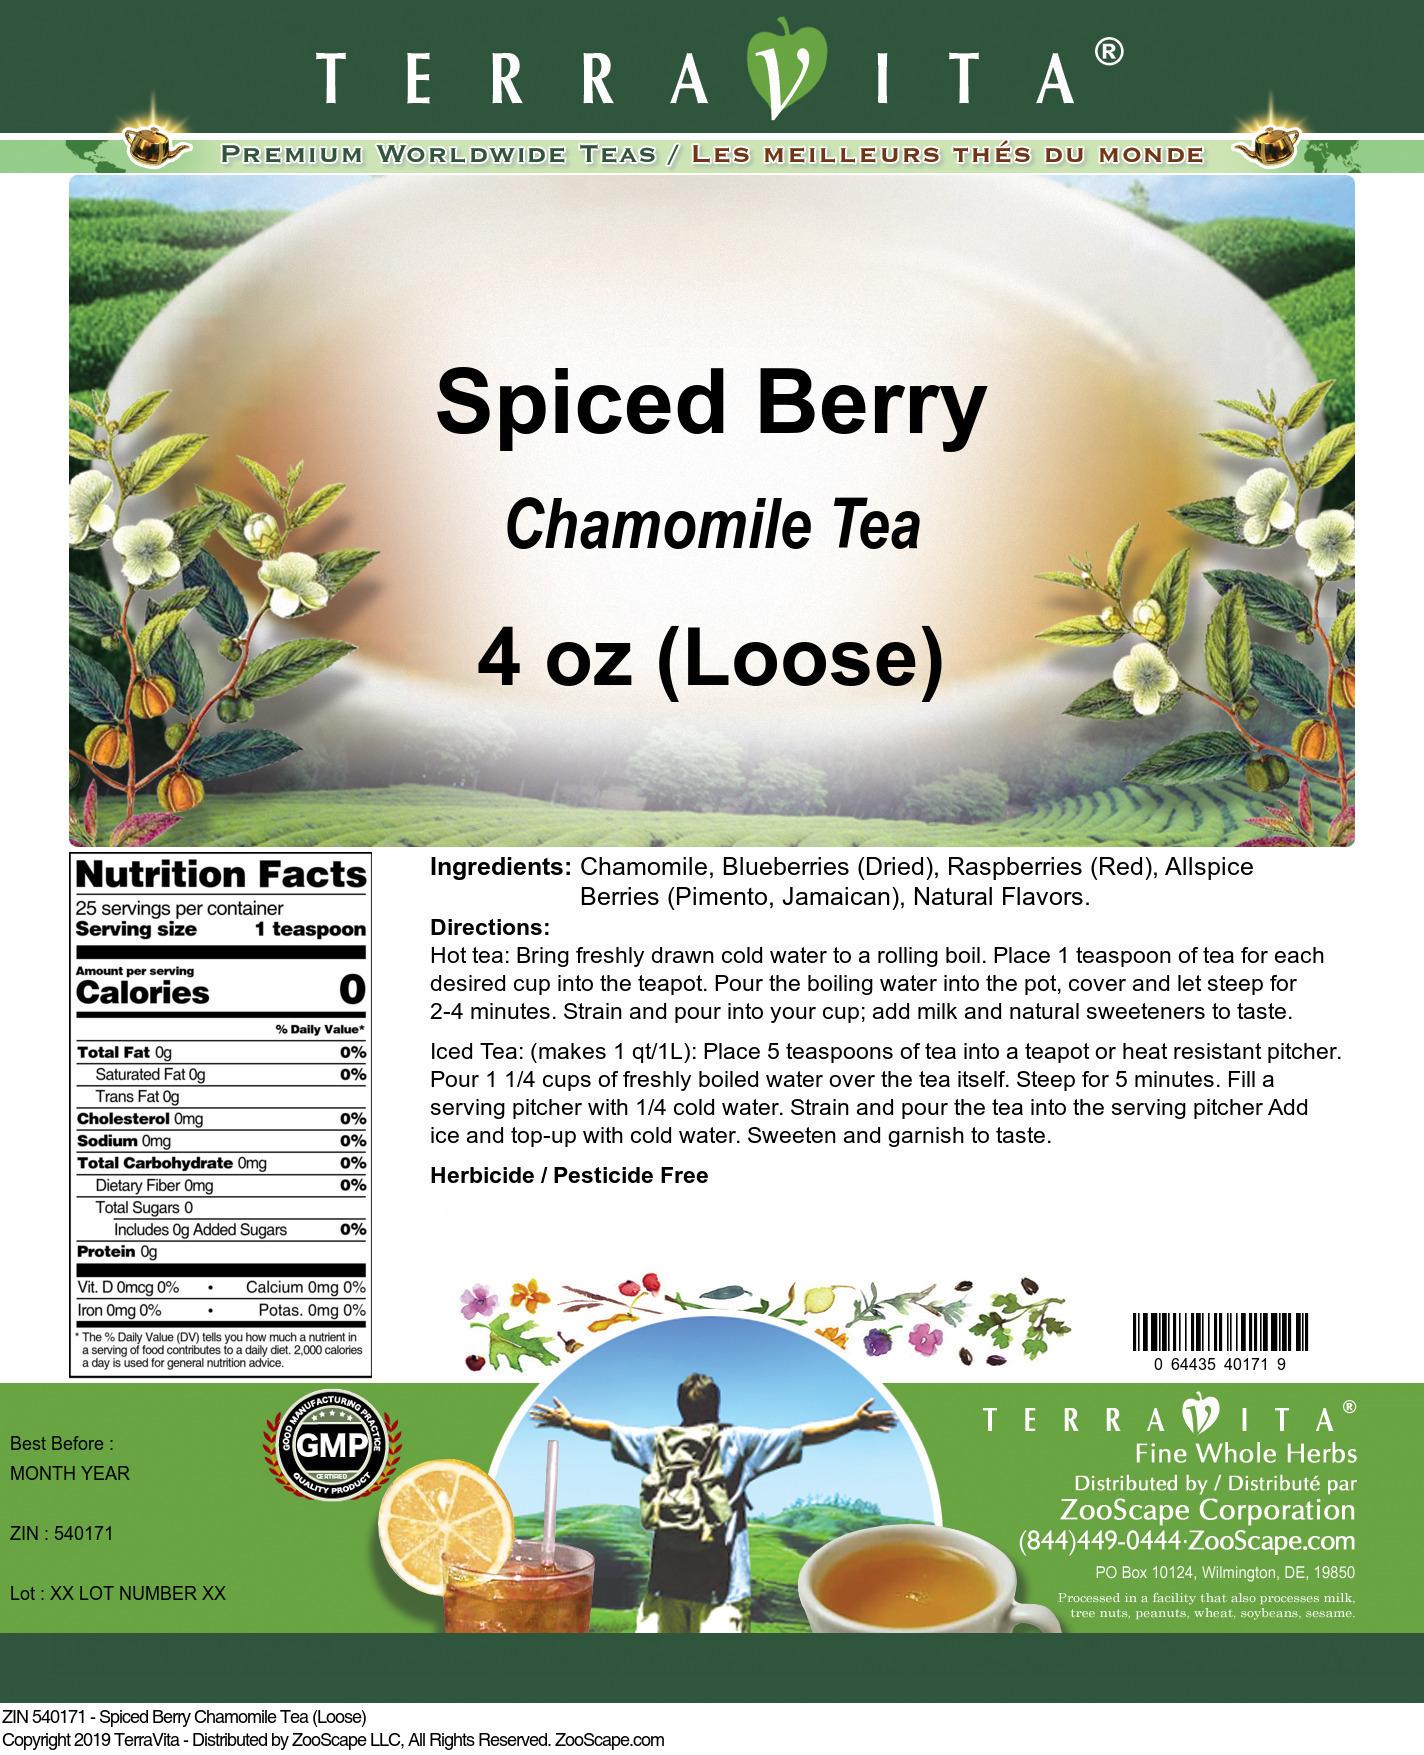 Spiced Berry Chamomile Tea (Loose)